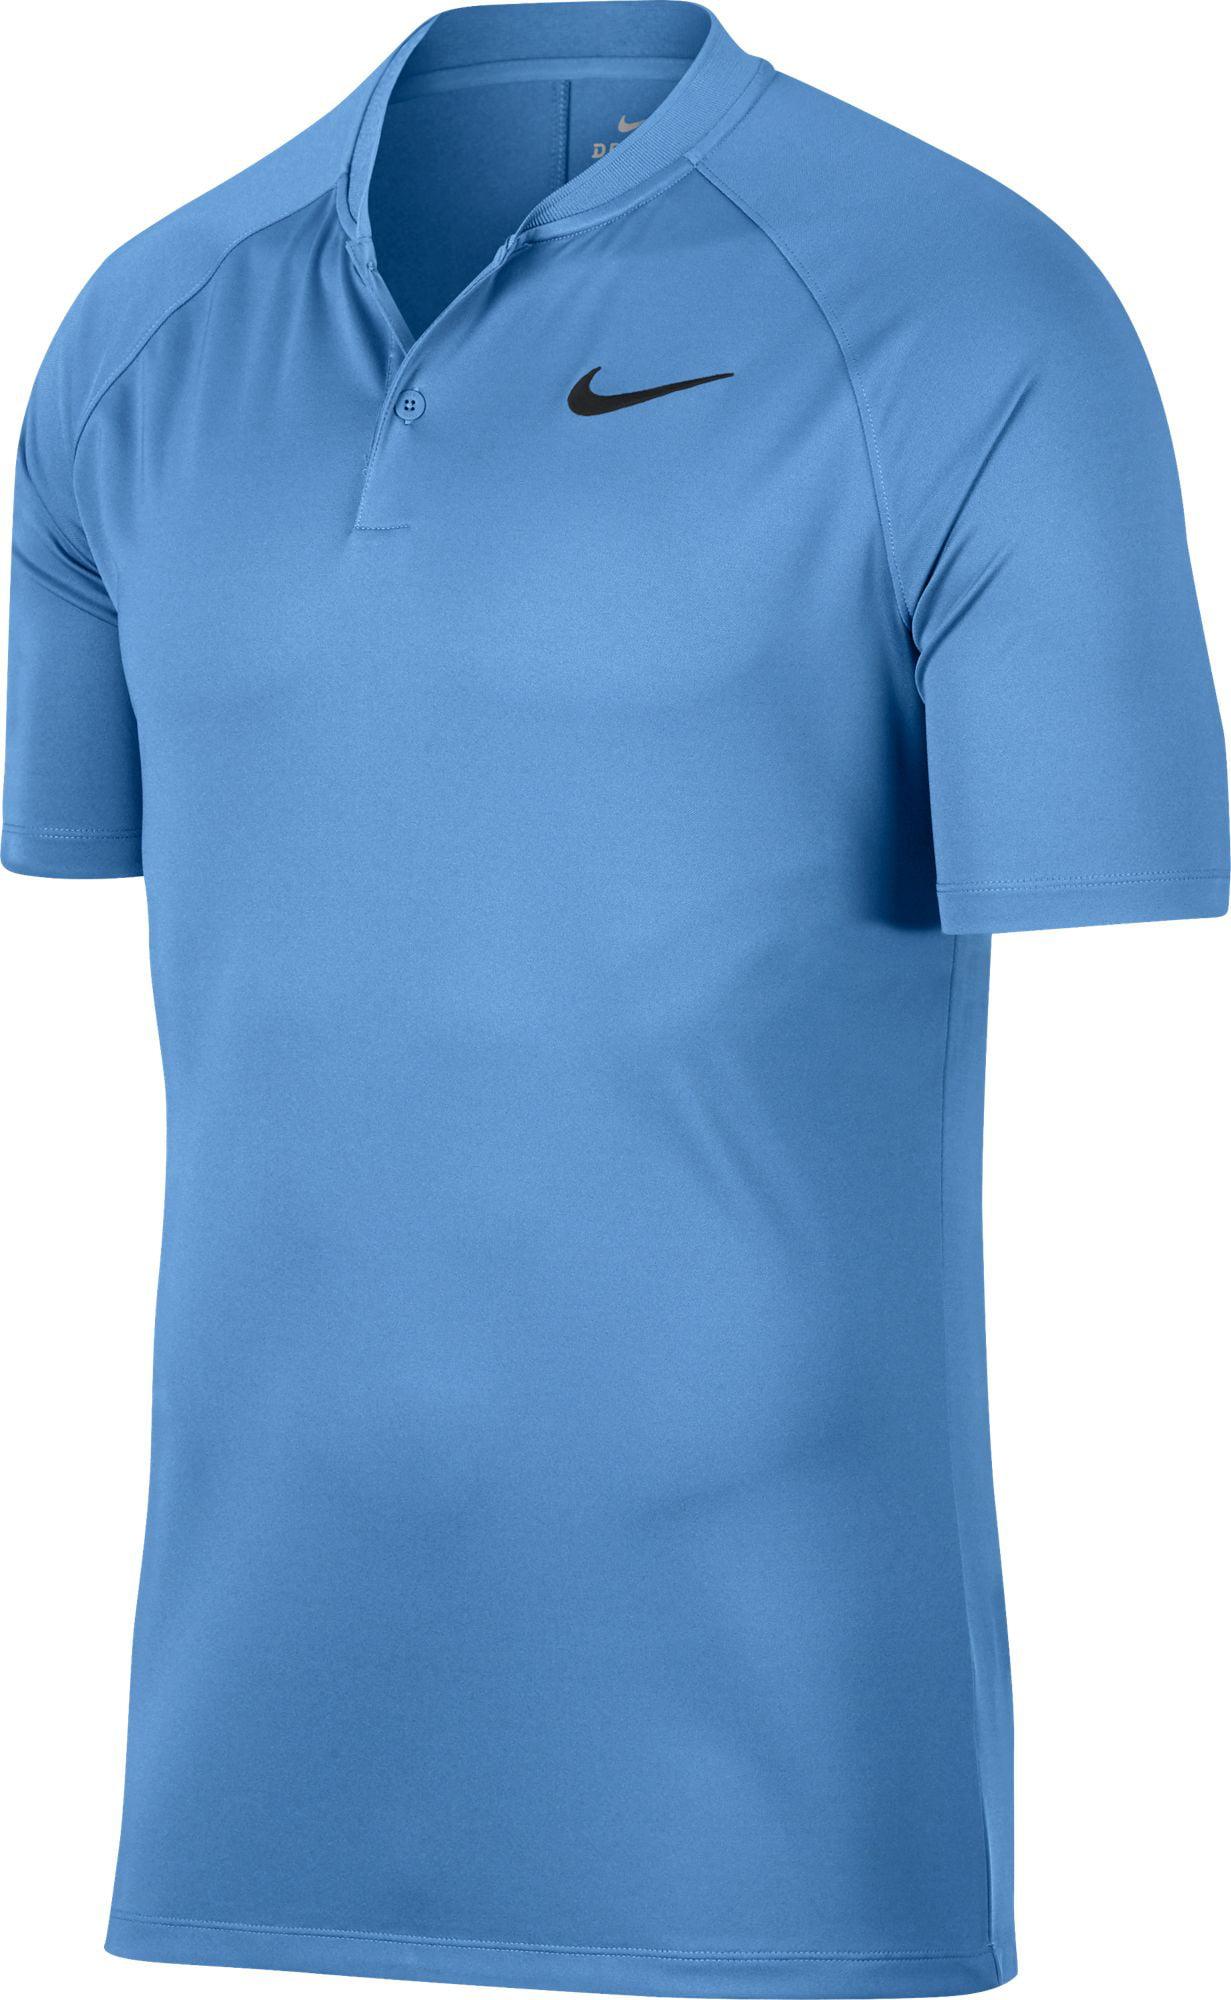 Nike Men's Dry Momentum Blade Collar